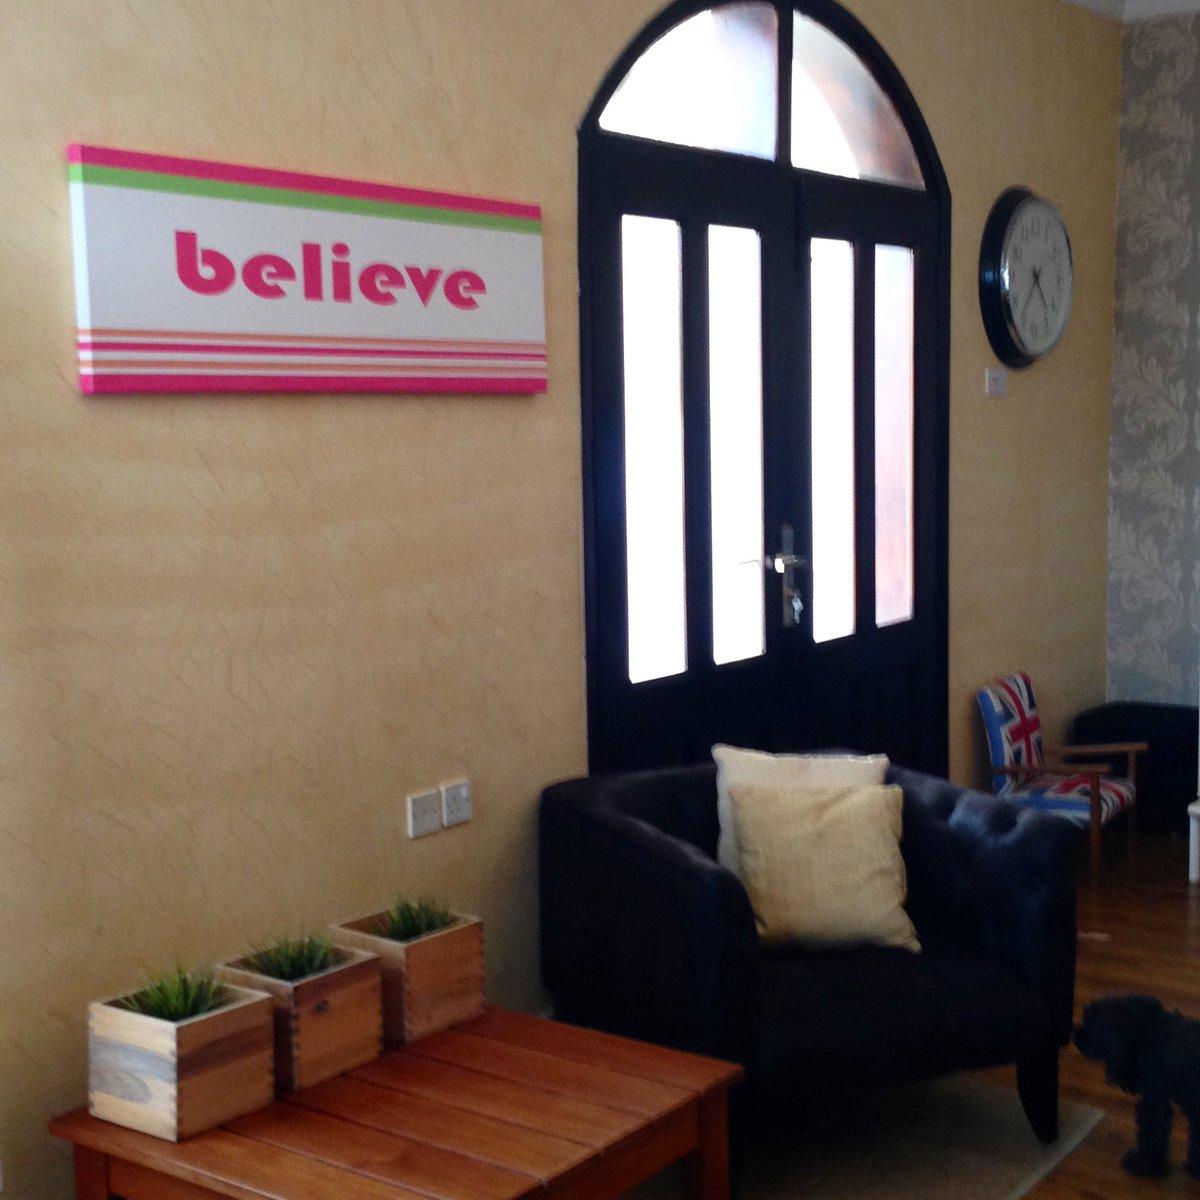 believe canvas #buynow #decor #home #seeit #feelit #liveit #believe #mijas #BristolCity #javea #gandia #mindart #mindfit #spain #france #yes<br>http://pic.twitter.com/JgXqHkADEk